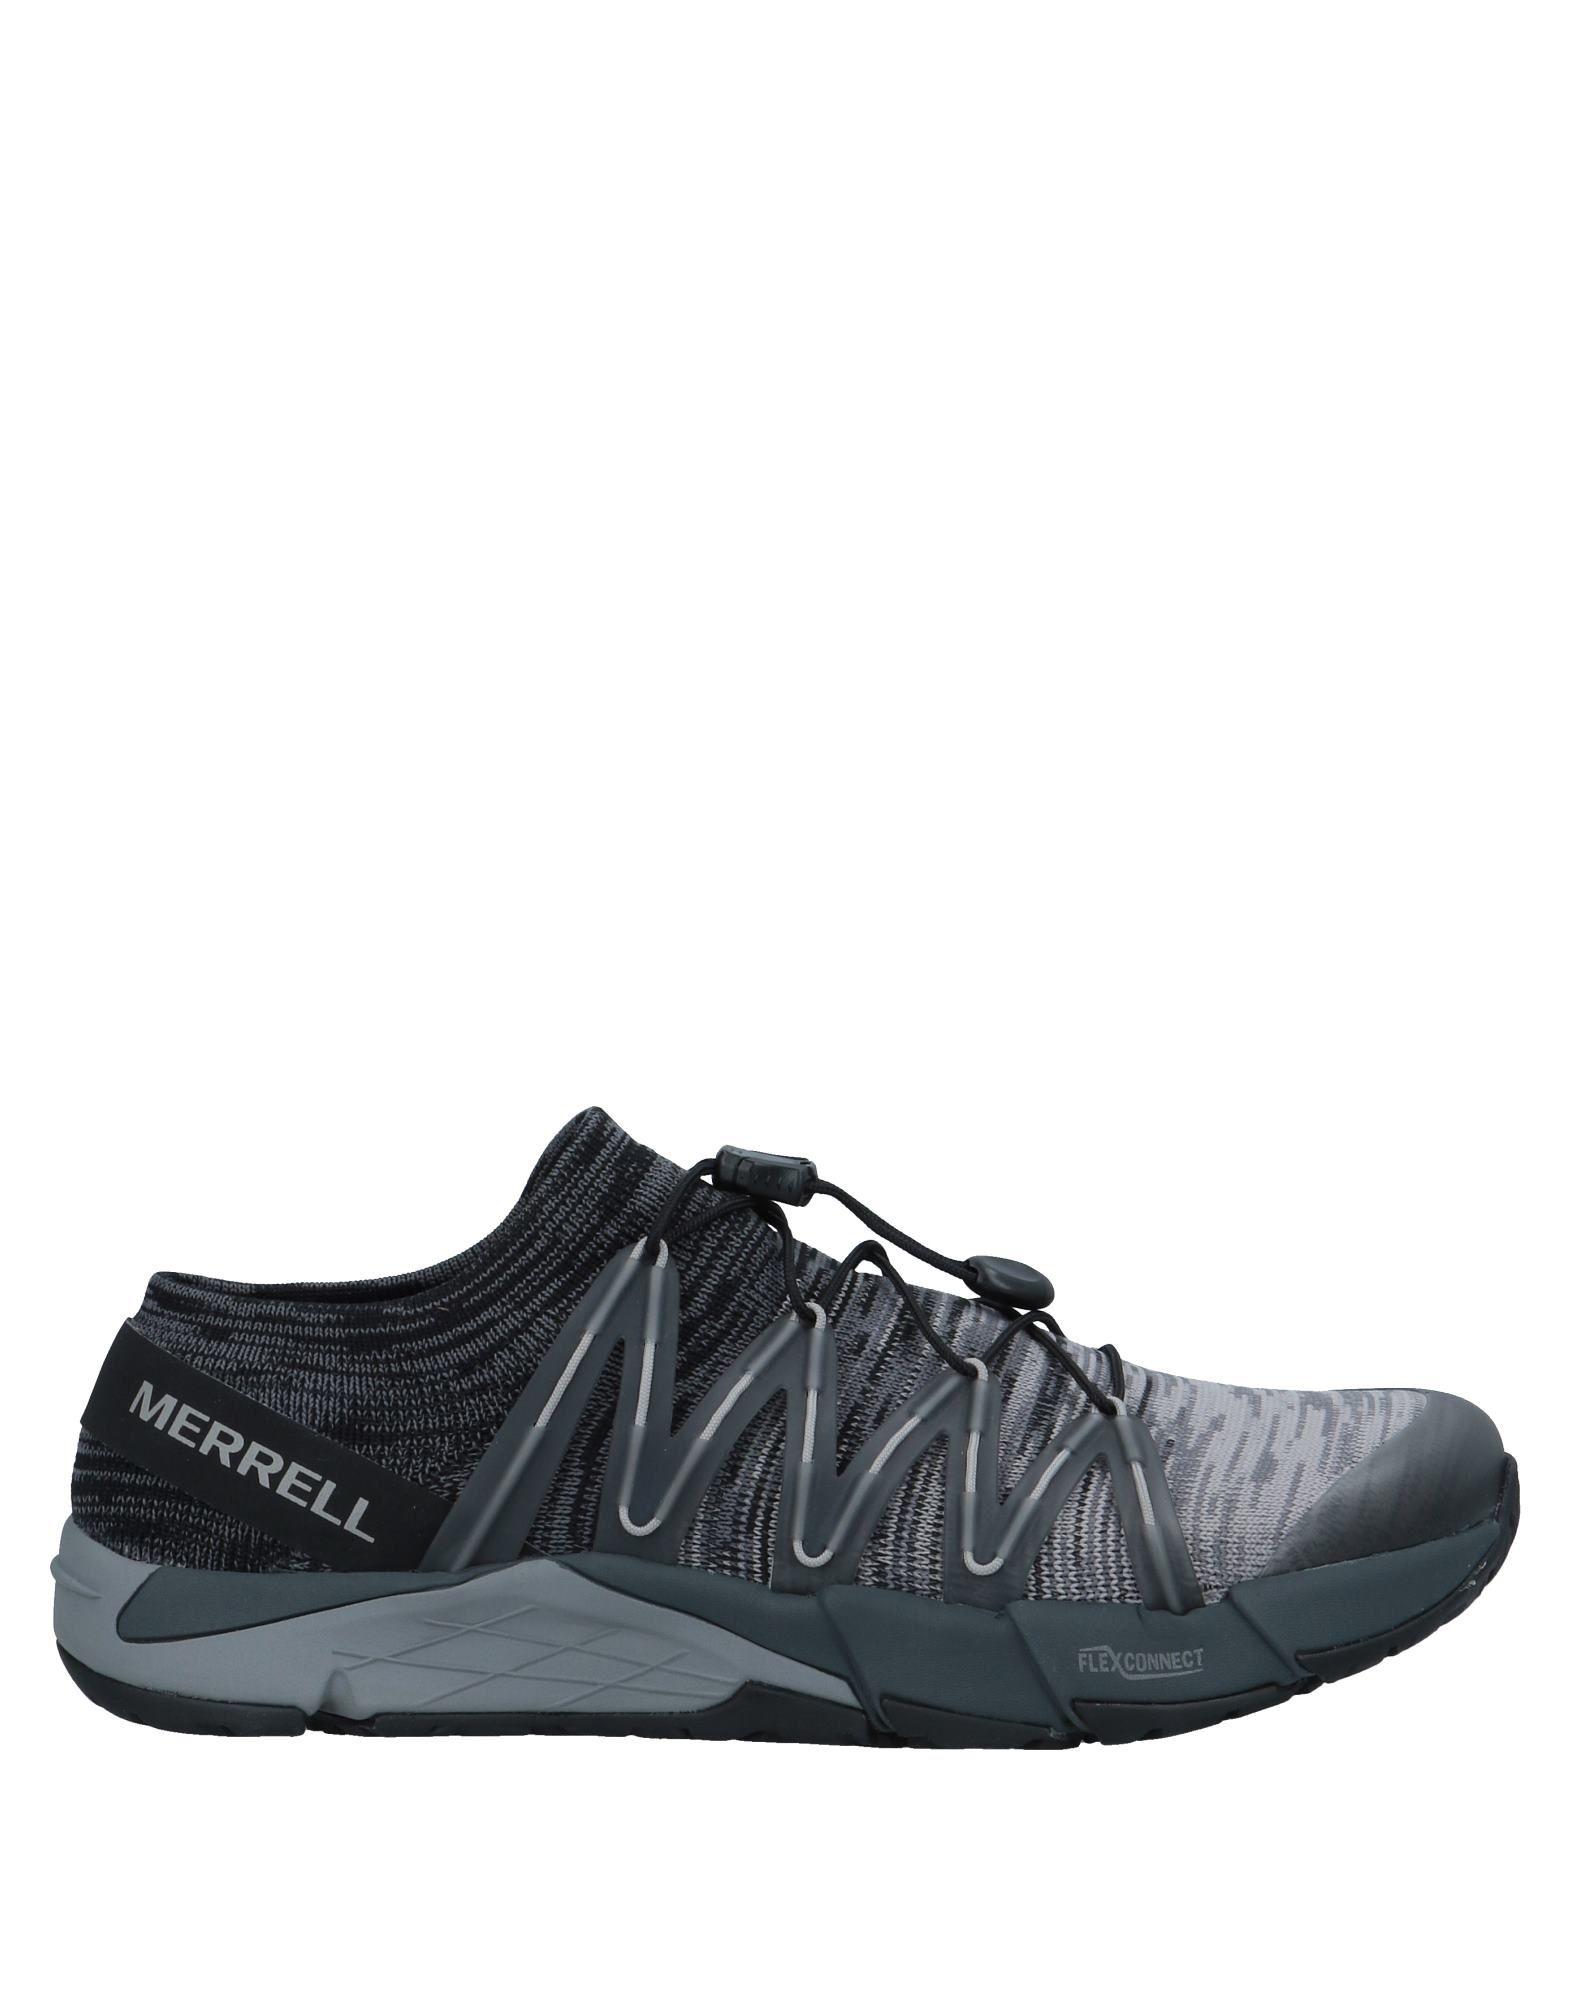 Merrell Sneakers - on Men Merrell Sneakers online on -  United Kingdom - 11581782QL f9d3d5